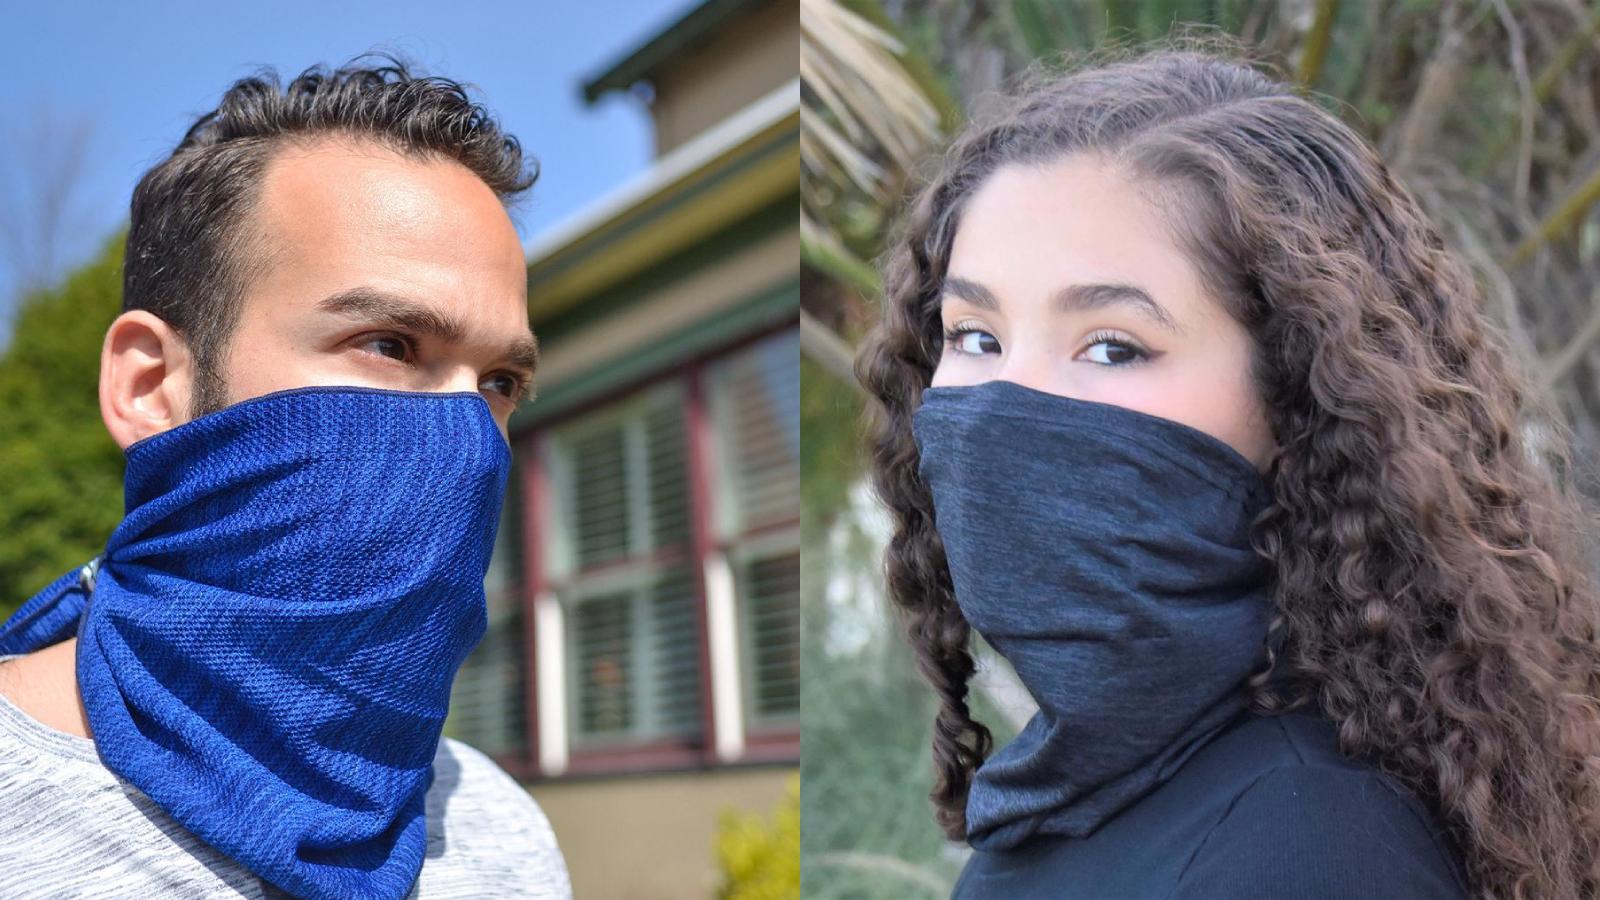 Cooling Neck Gaiter with Filter for Men Women Kids Face Covering Bandana Gator Mask Pocket Nose Wire